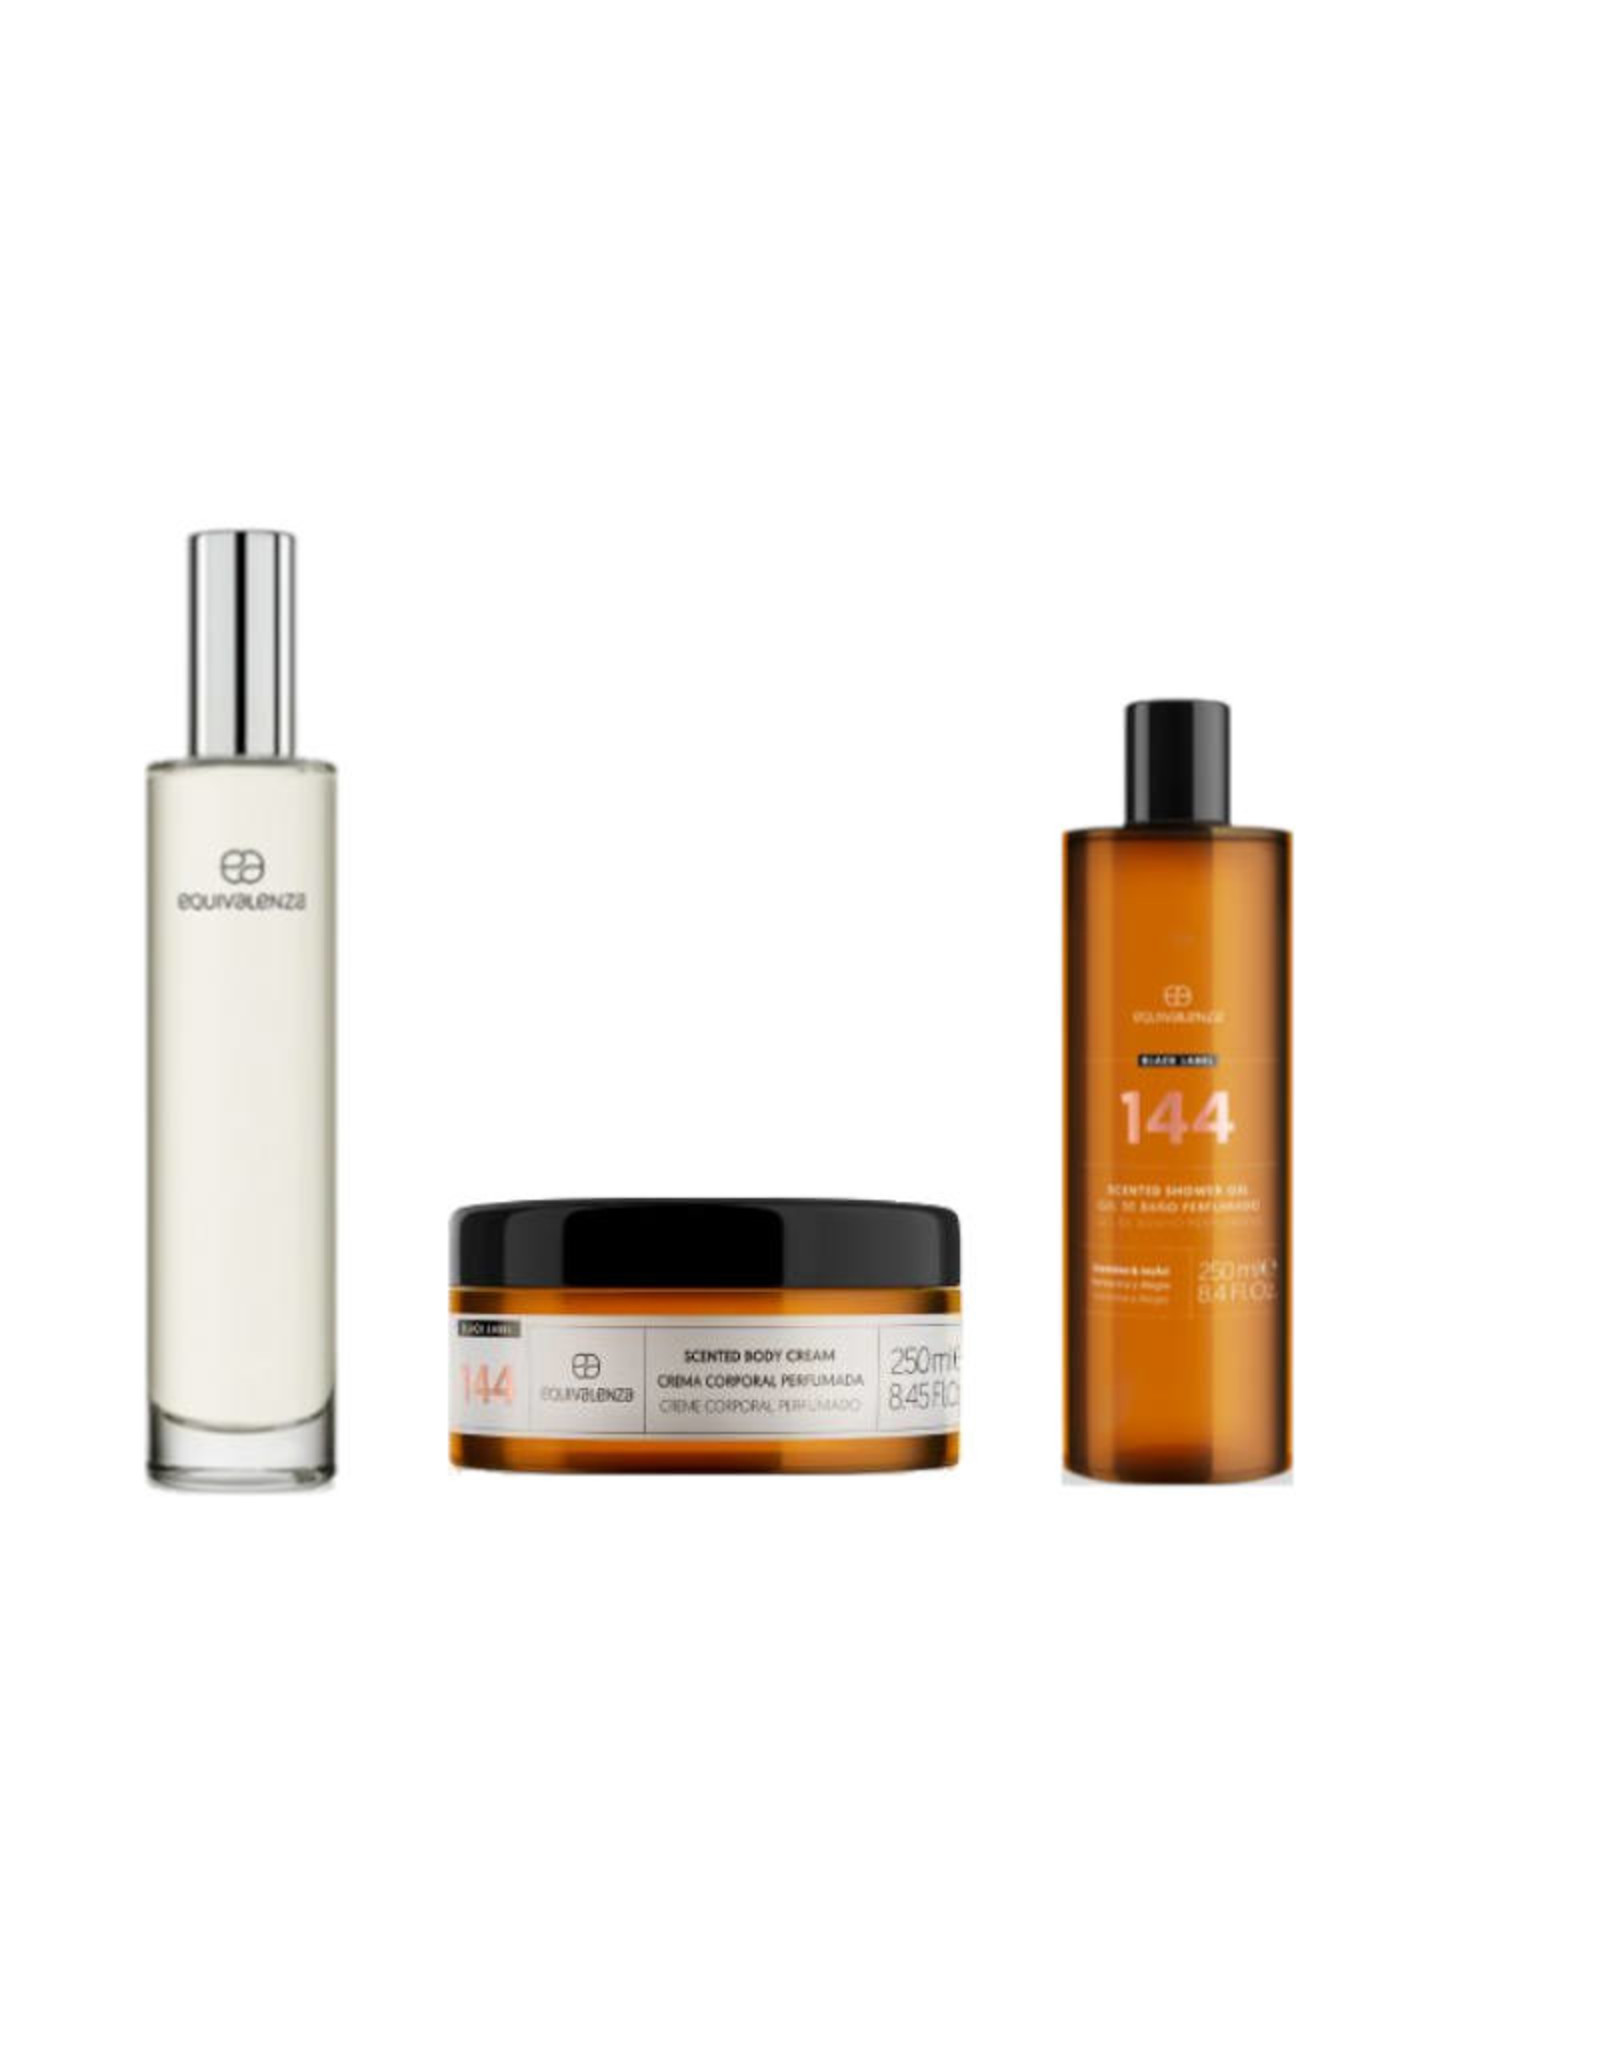 Equivalenza BUNDLE - Perfume - Shower Gel - Body Cream -144